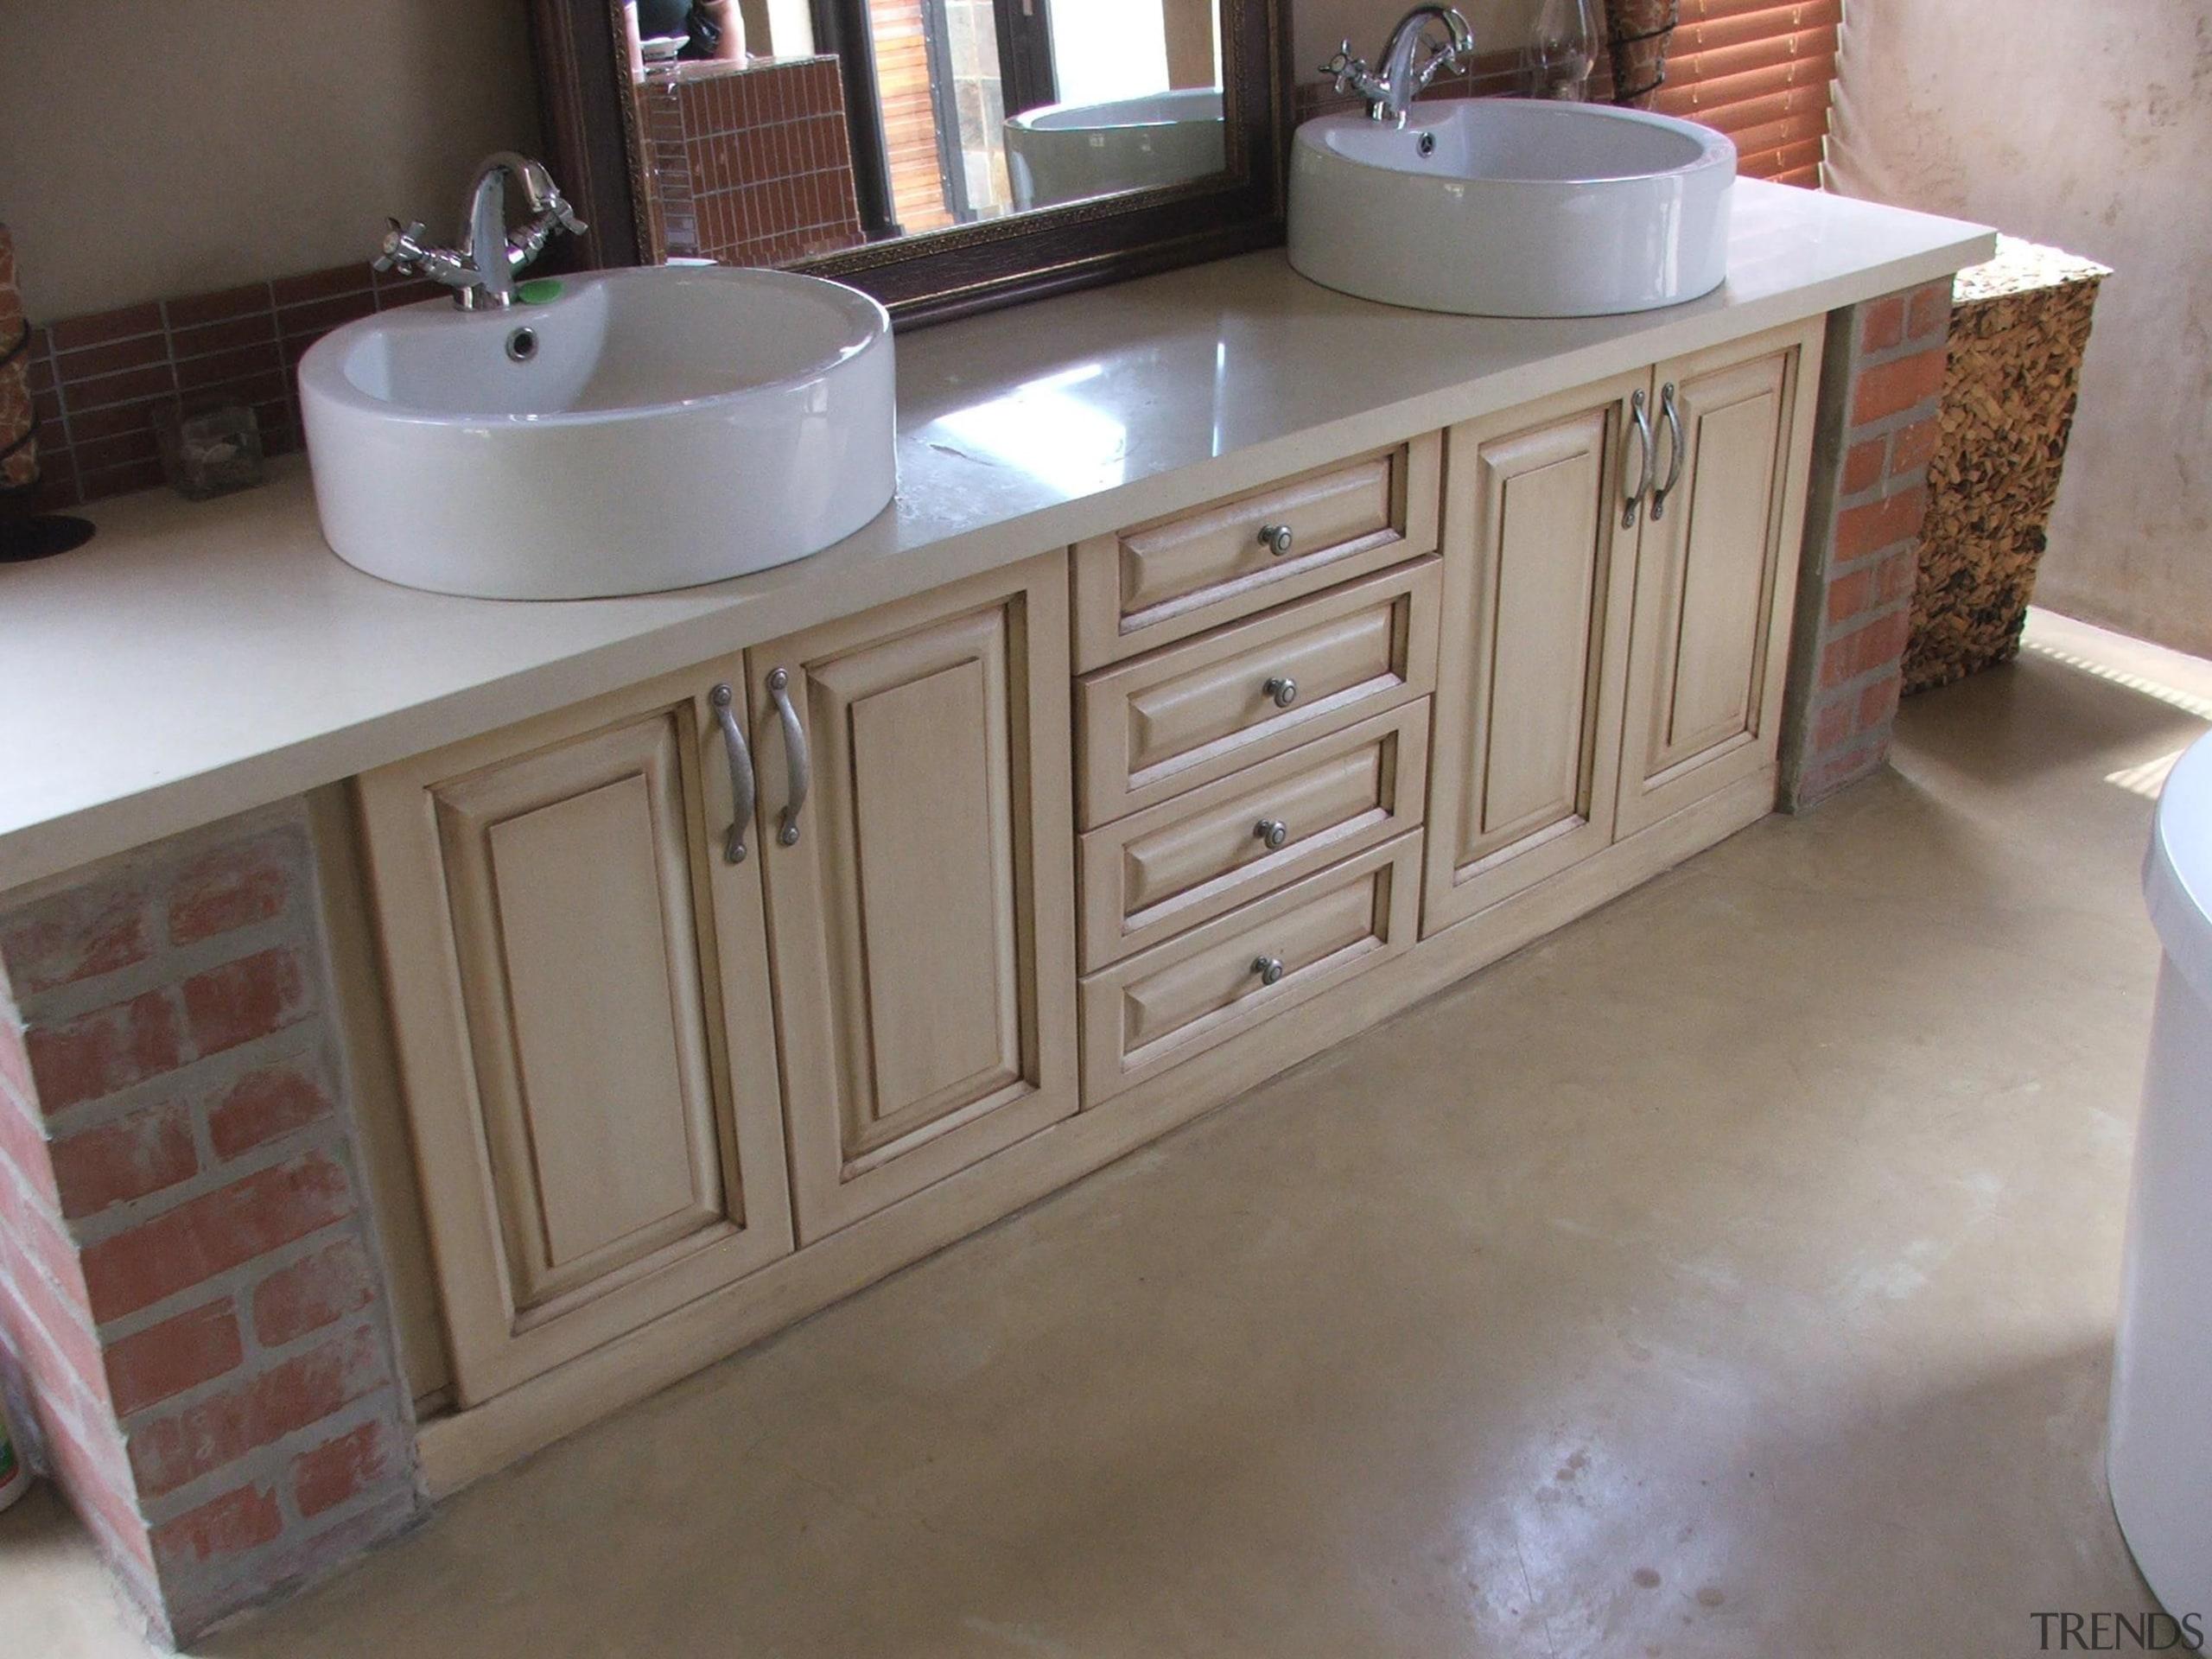 Colour hardener  23 - Colour_hardener__23 - bathroom bathroom, bathroom accessory, bathroom cabinet, cabinetry, countertop, cuisine classique, drawer, floor, flooring, furniture, hardwood, kitchen, room, sink, tile, wood stain, gray